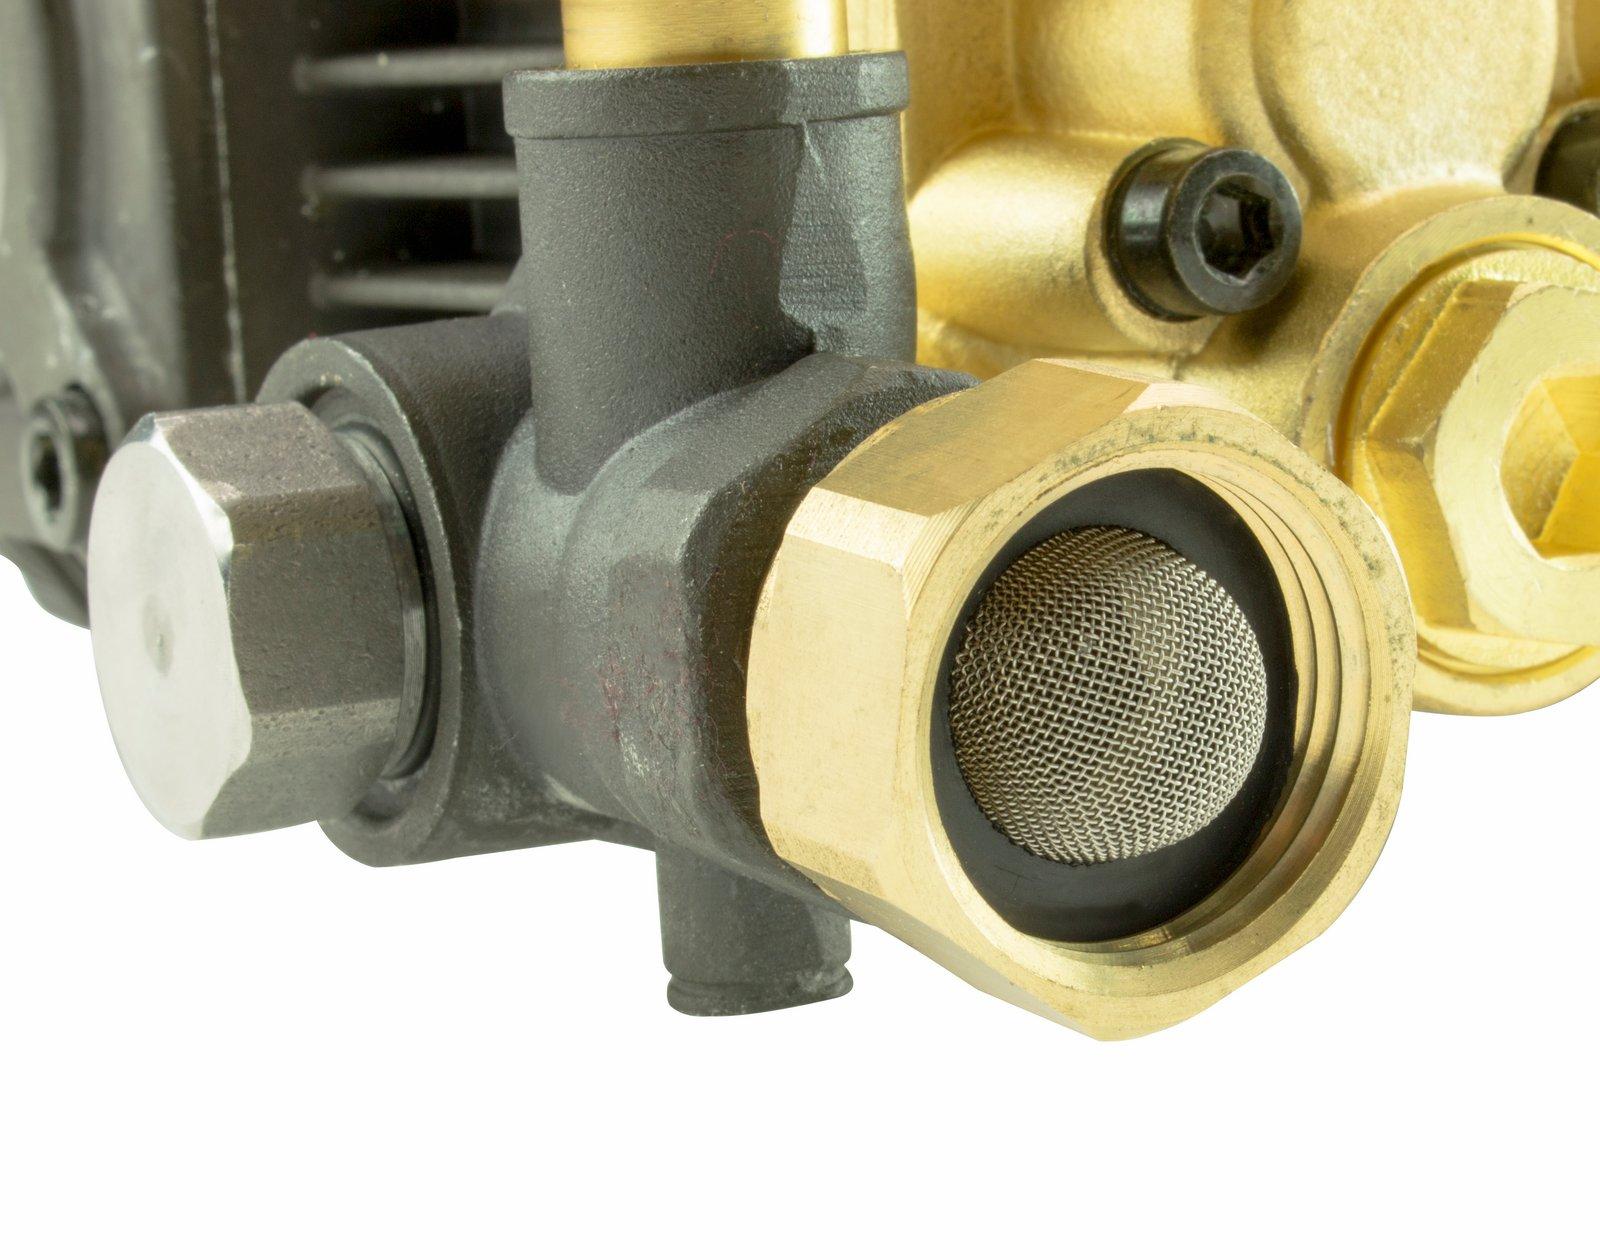 ERIE TOOLS TRIPLEX Pressure Washer Pump for Cat General AR, 5 7 GPM, 3200  PSI